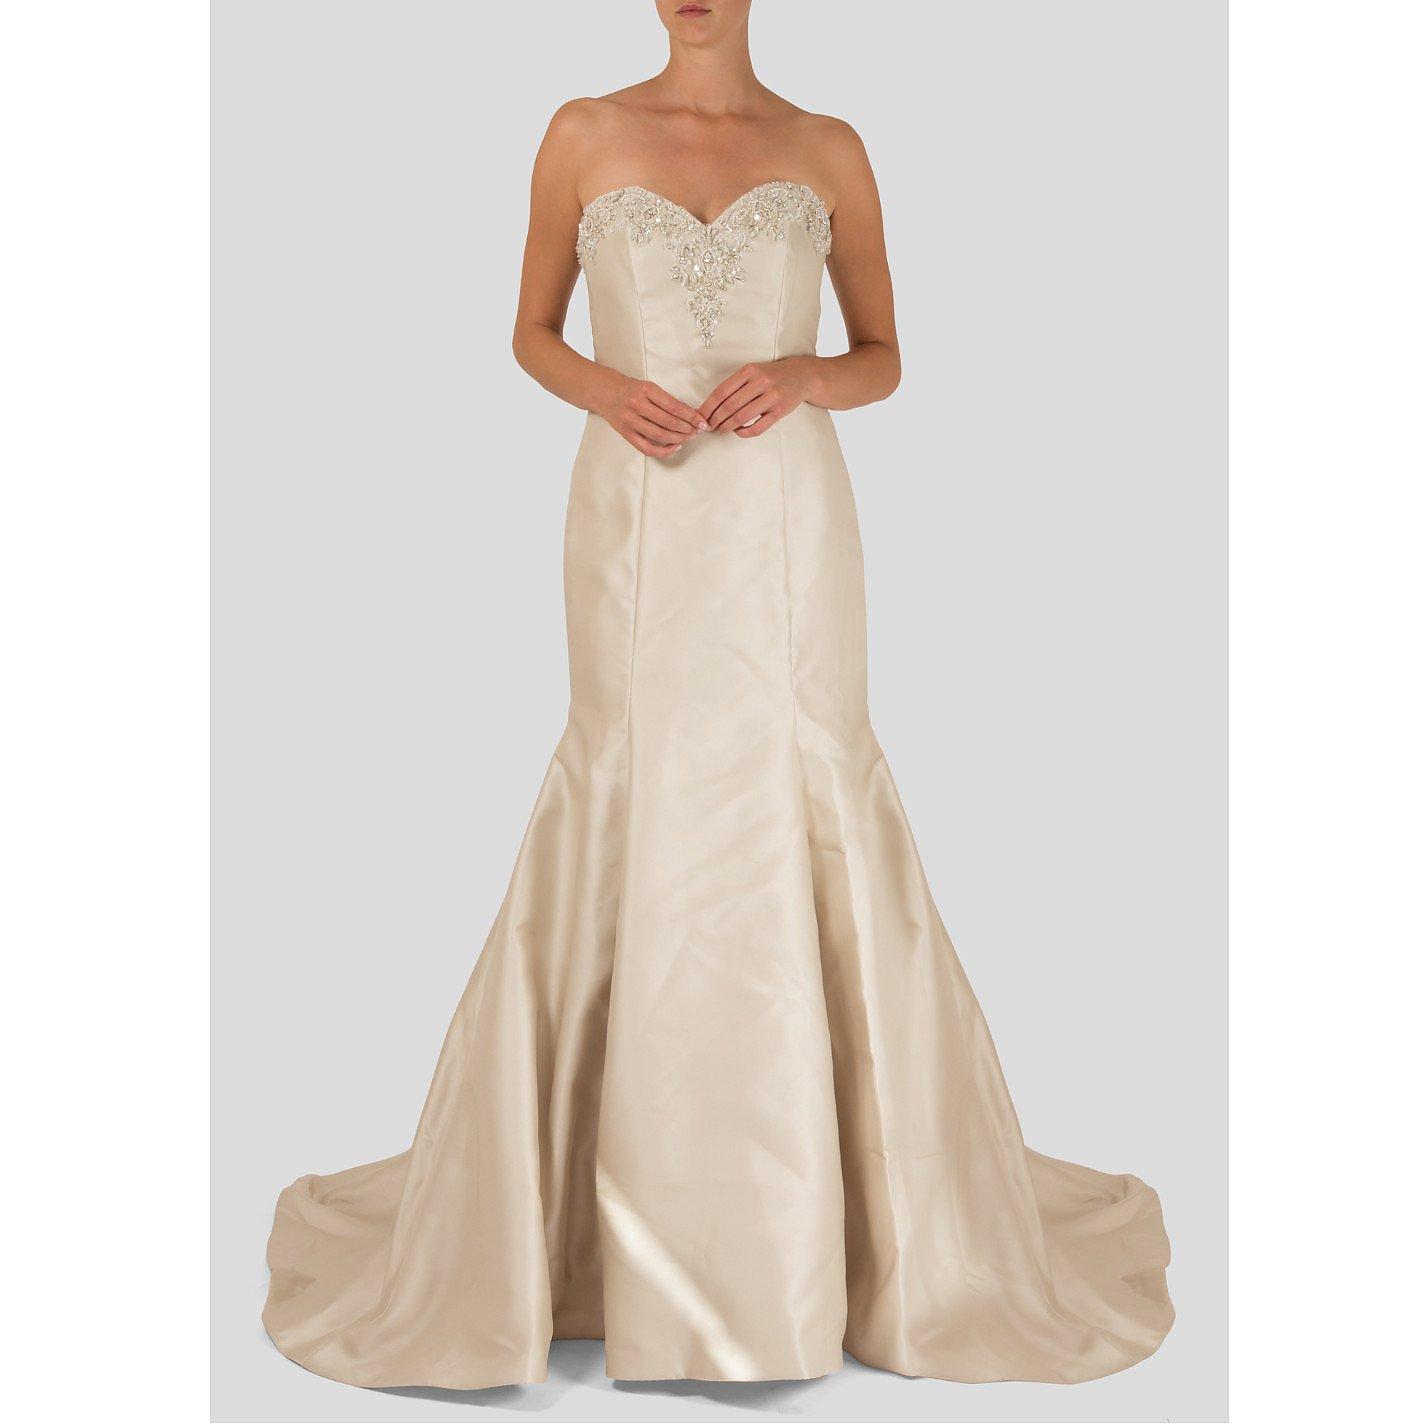 Morilee Strapless Embellished Bridal Gown